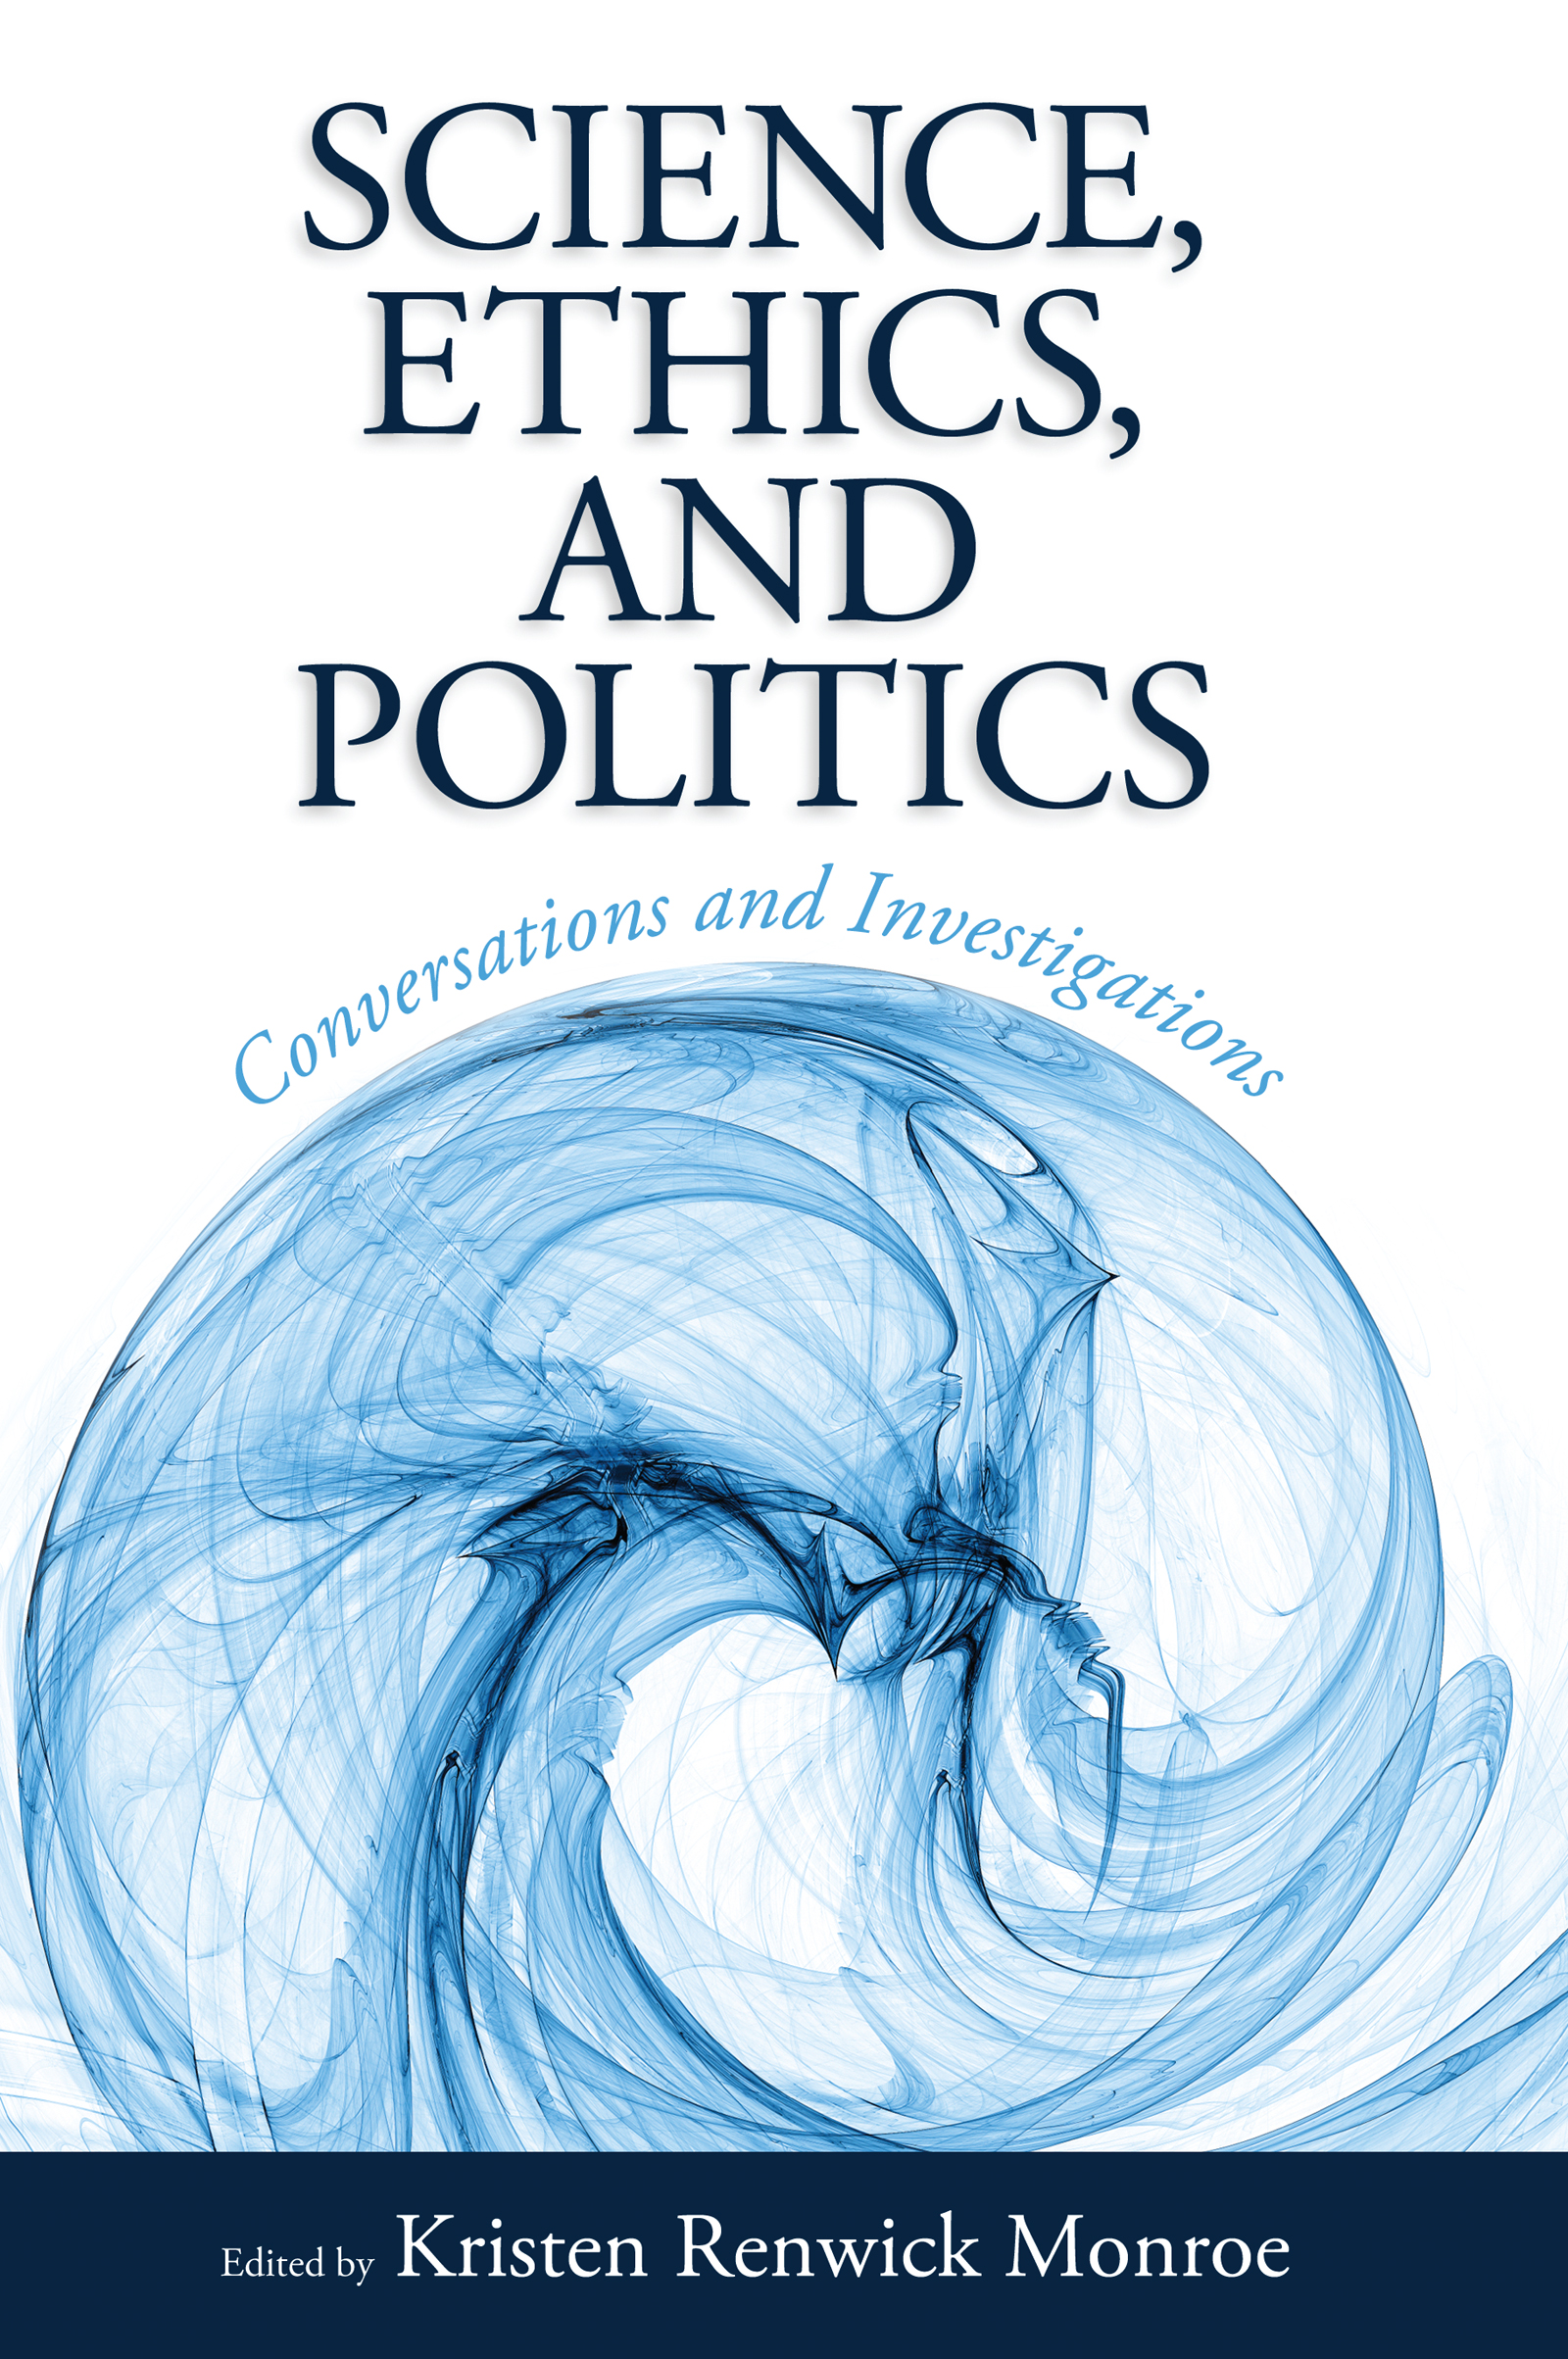 Science, Ethics, and Politics